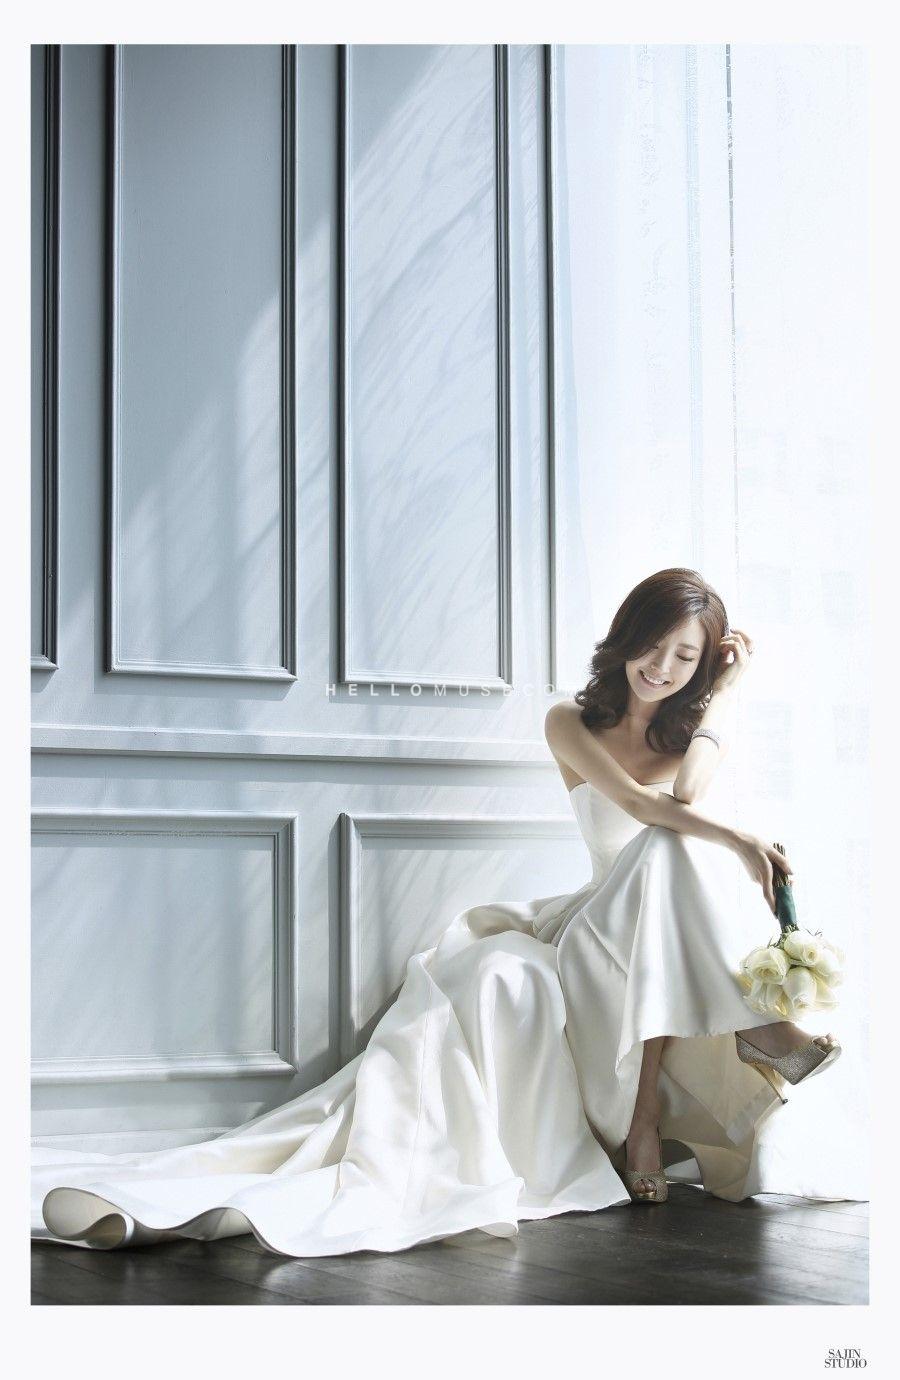 Korean style pre wedding photographykorean premium wedding